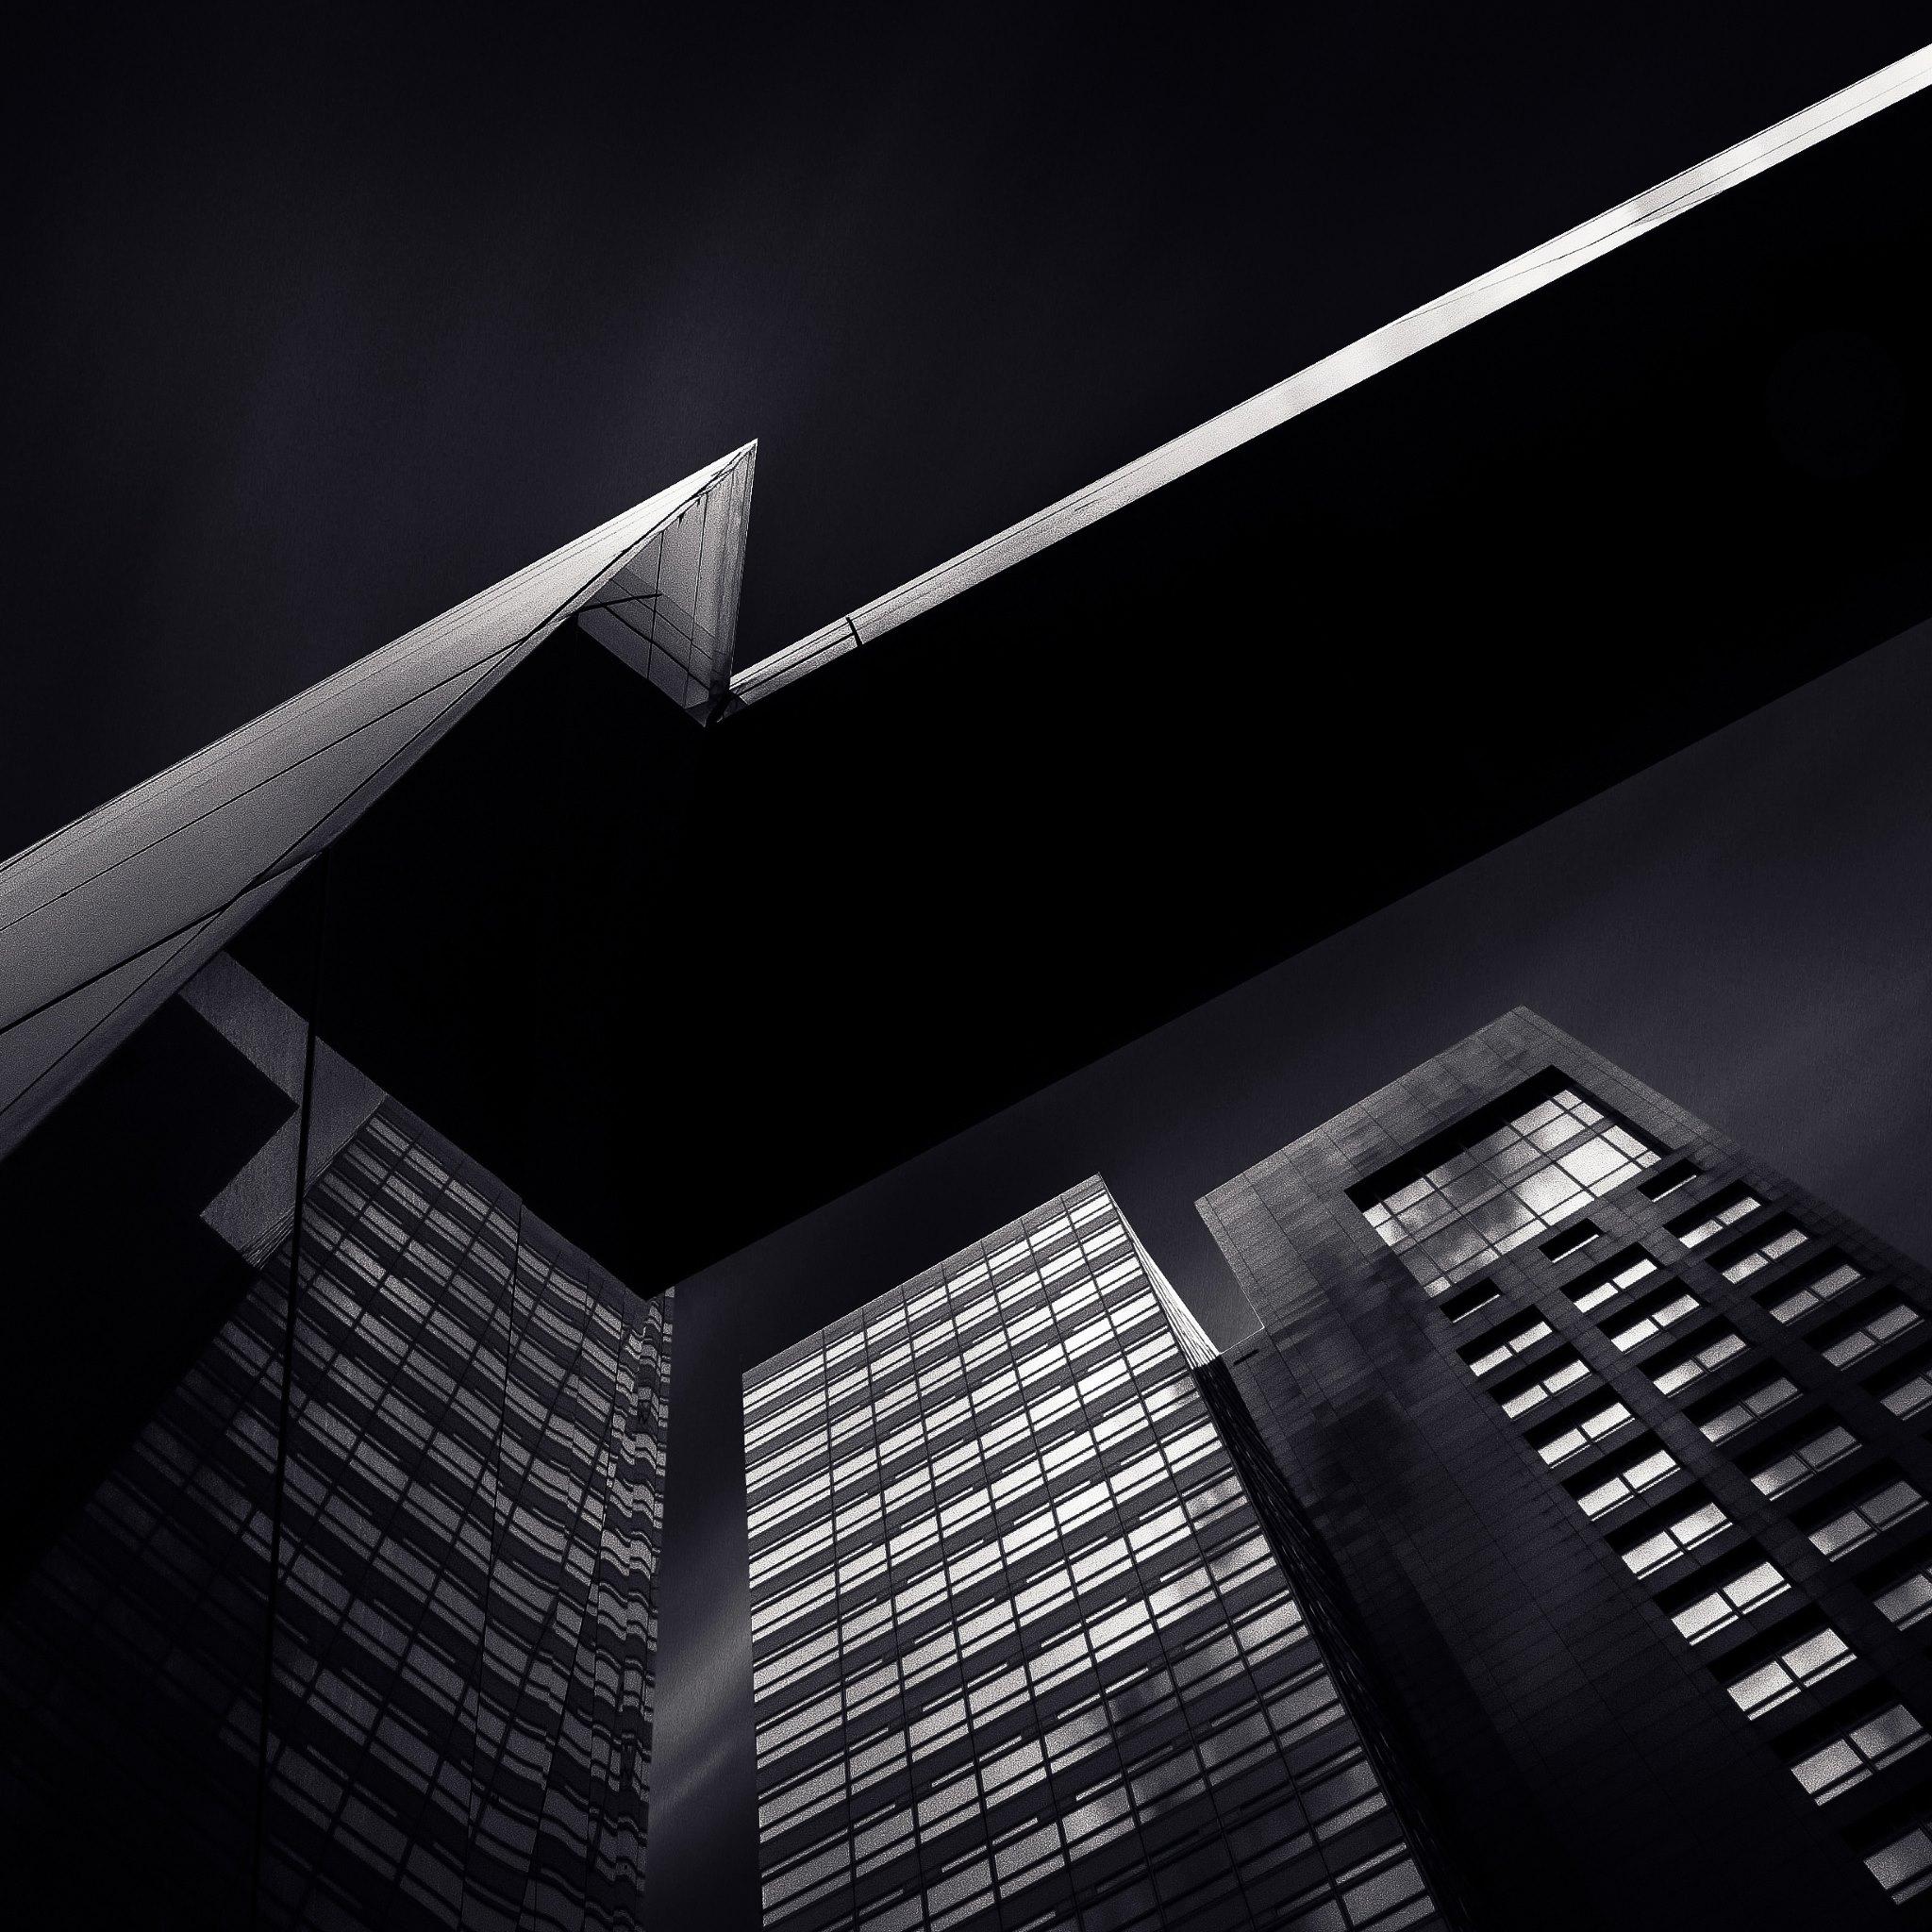 Urban View: Retina IPad Wallpaper 2048x2048. Best HD Wallpapers For